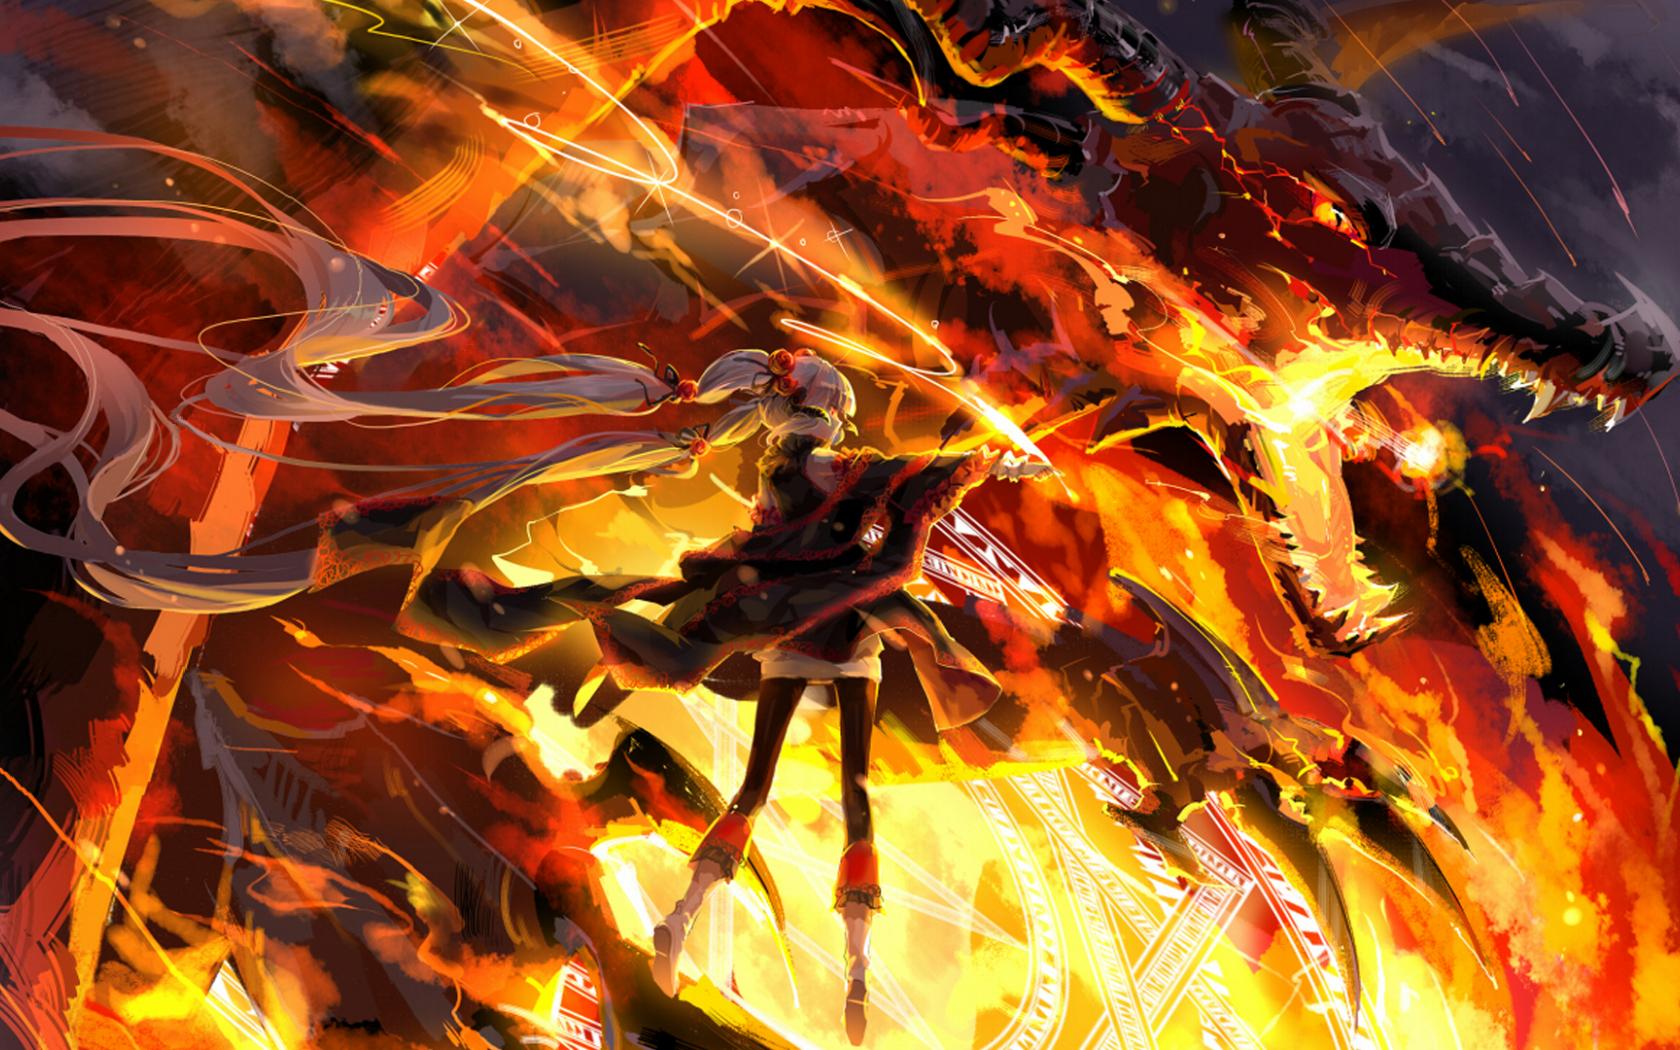 Free Download Cool Fire Dragon Wallpaper Fire Dragon Photos